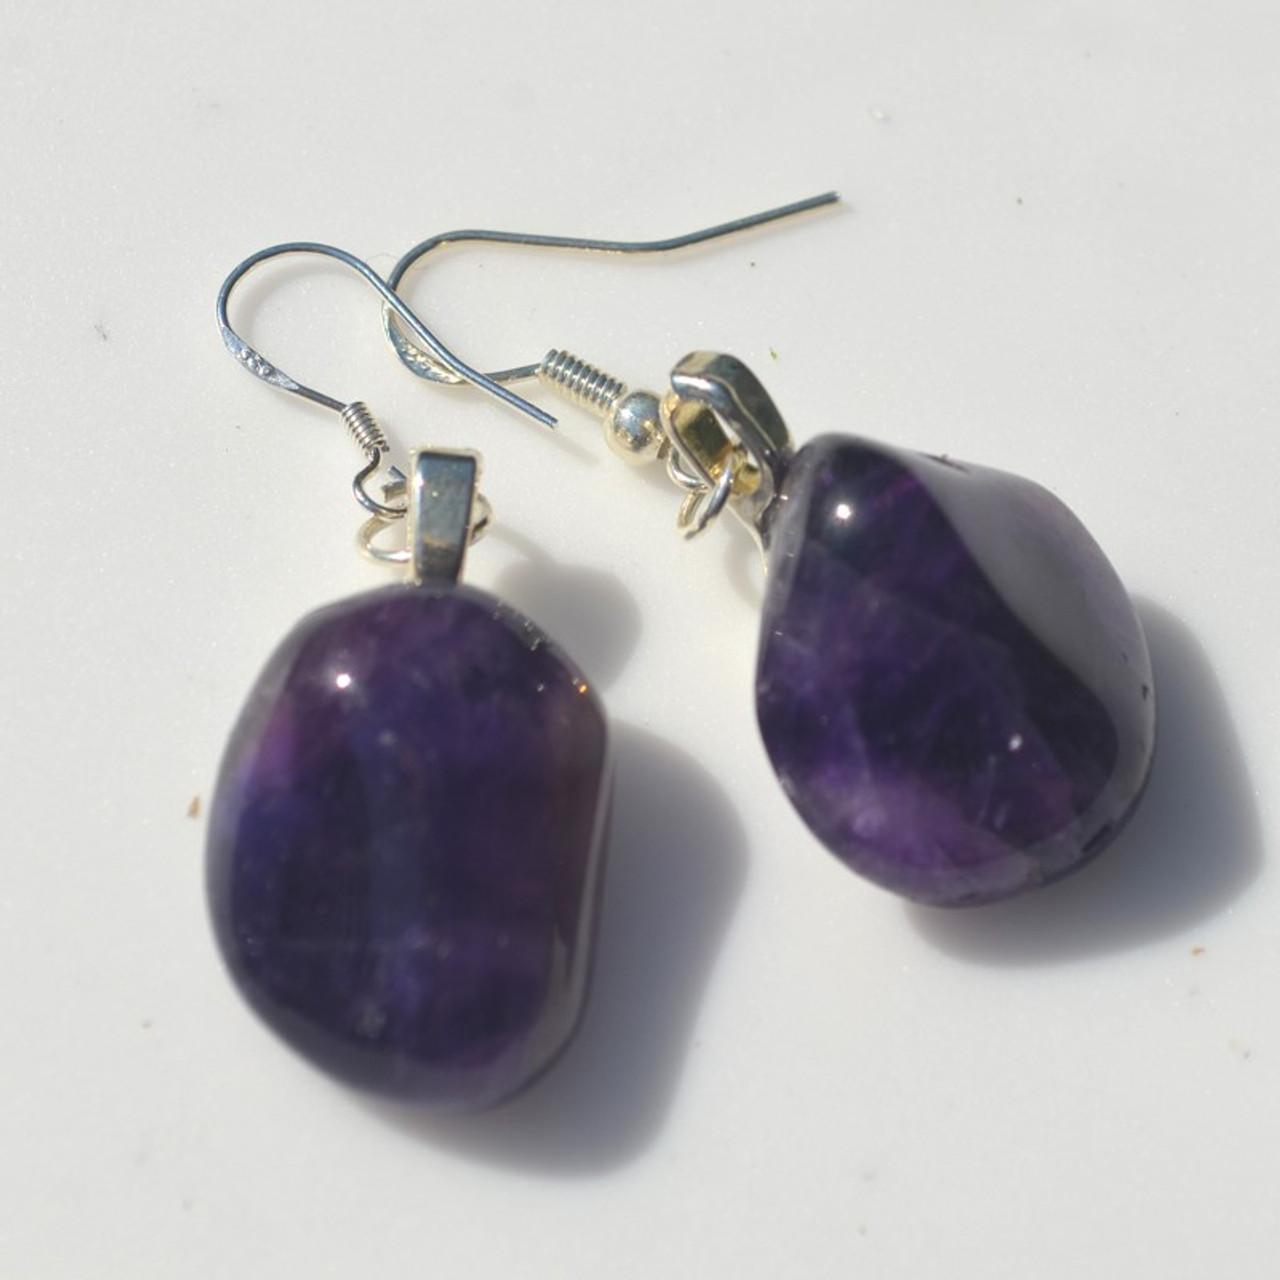 Amethyst Dangling Earrings - 1 Set - Made to Order